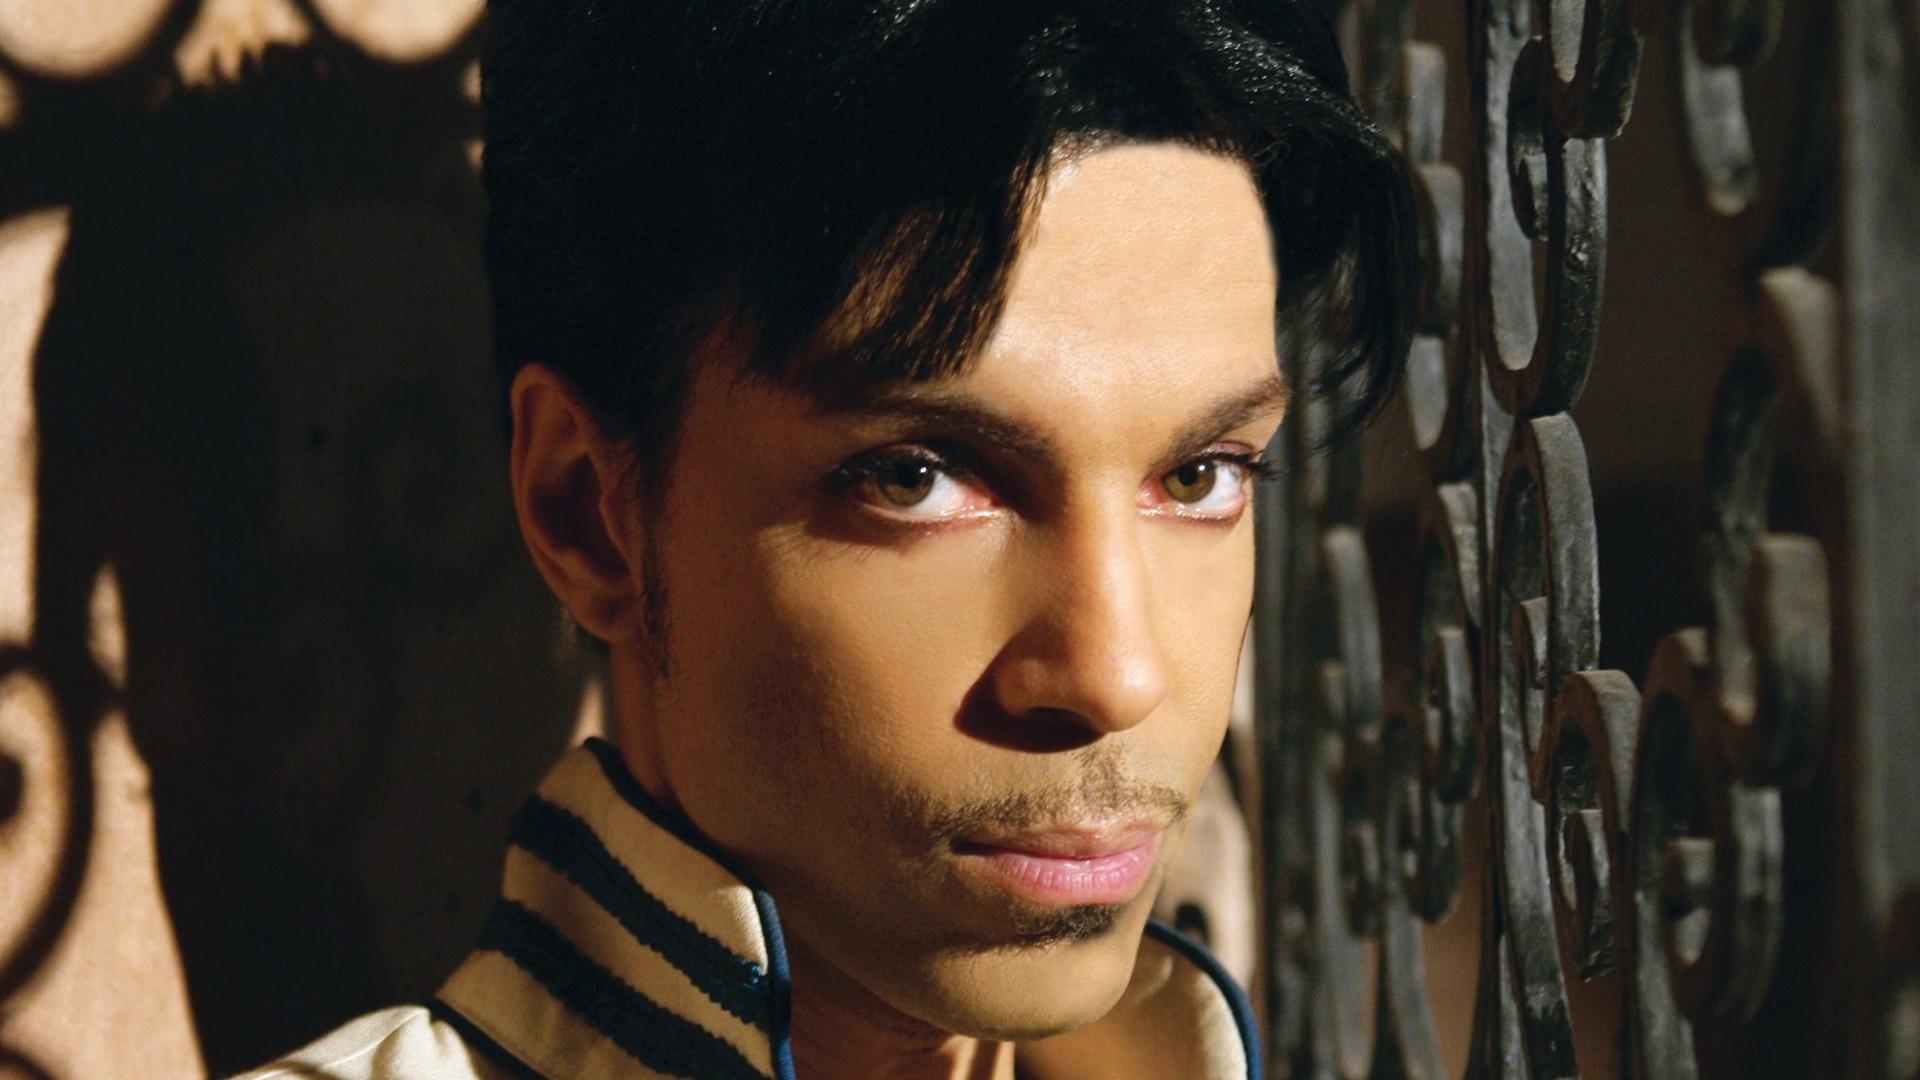 Április 16. – Évfordulós No.1 dal Prince-től!